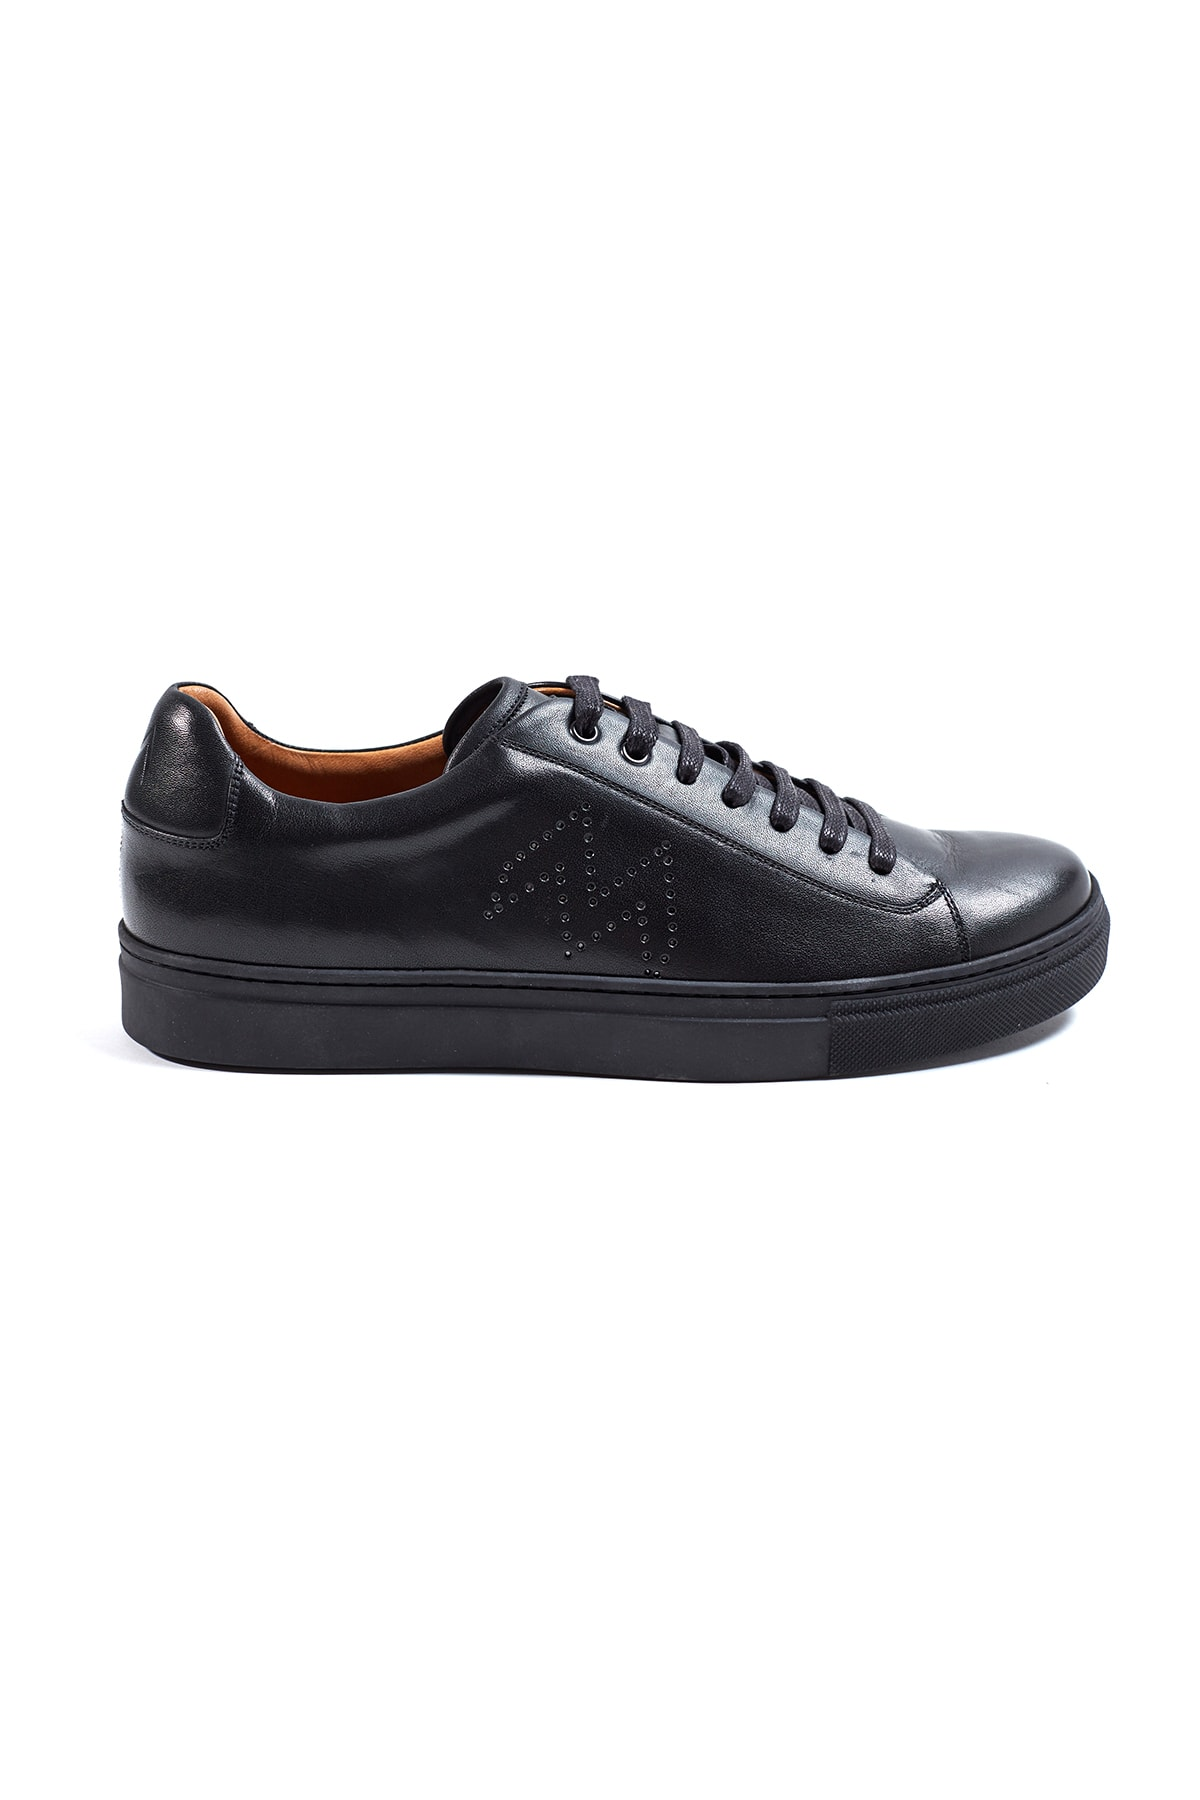 Hemington Siyah El Yapımı Deri Sneakers 1